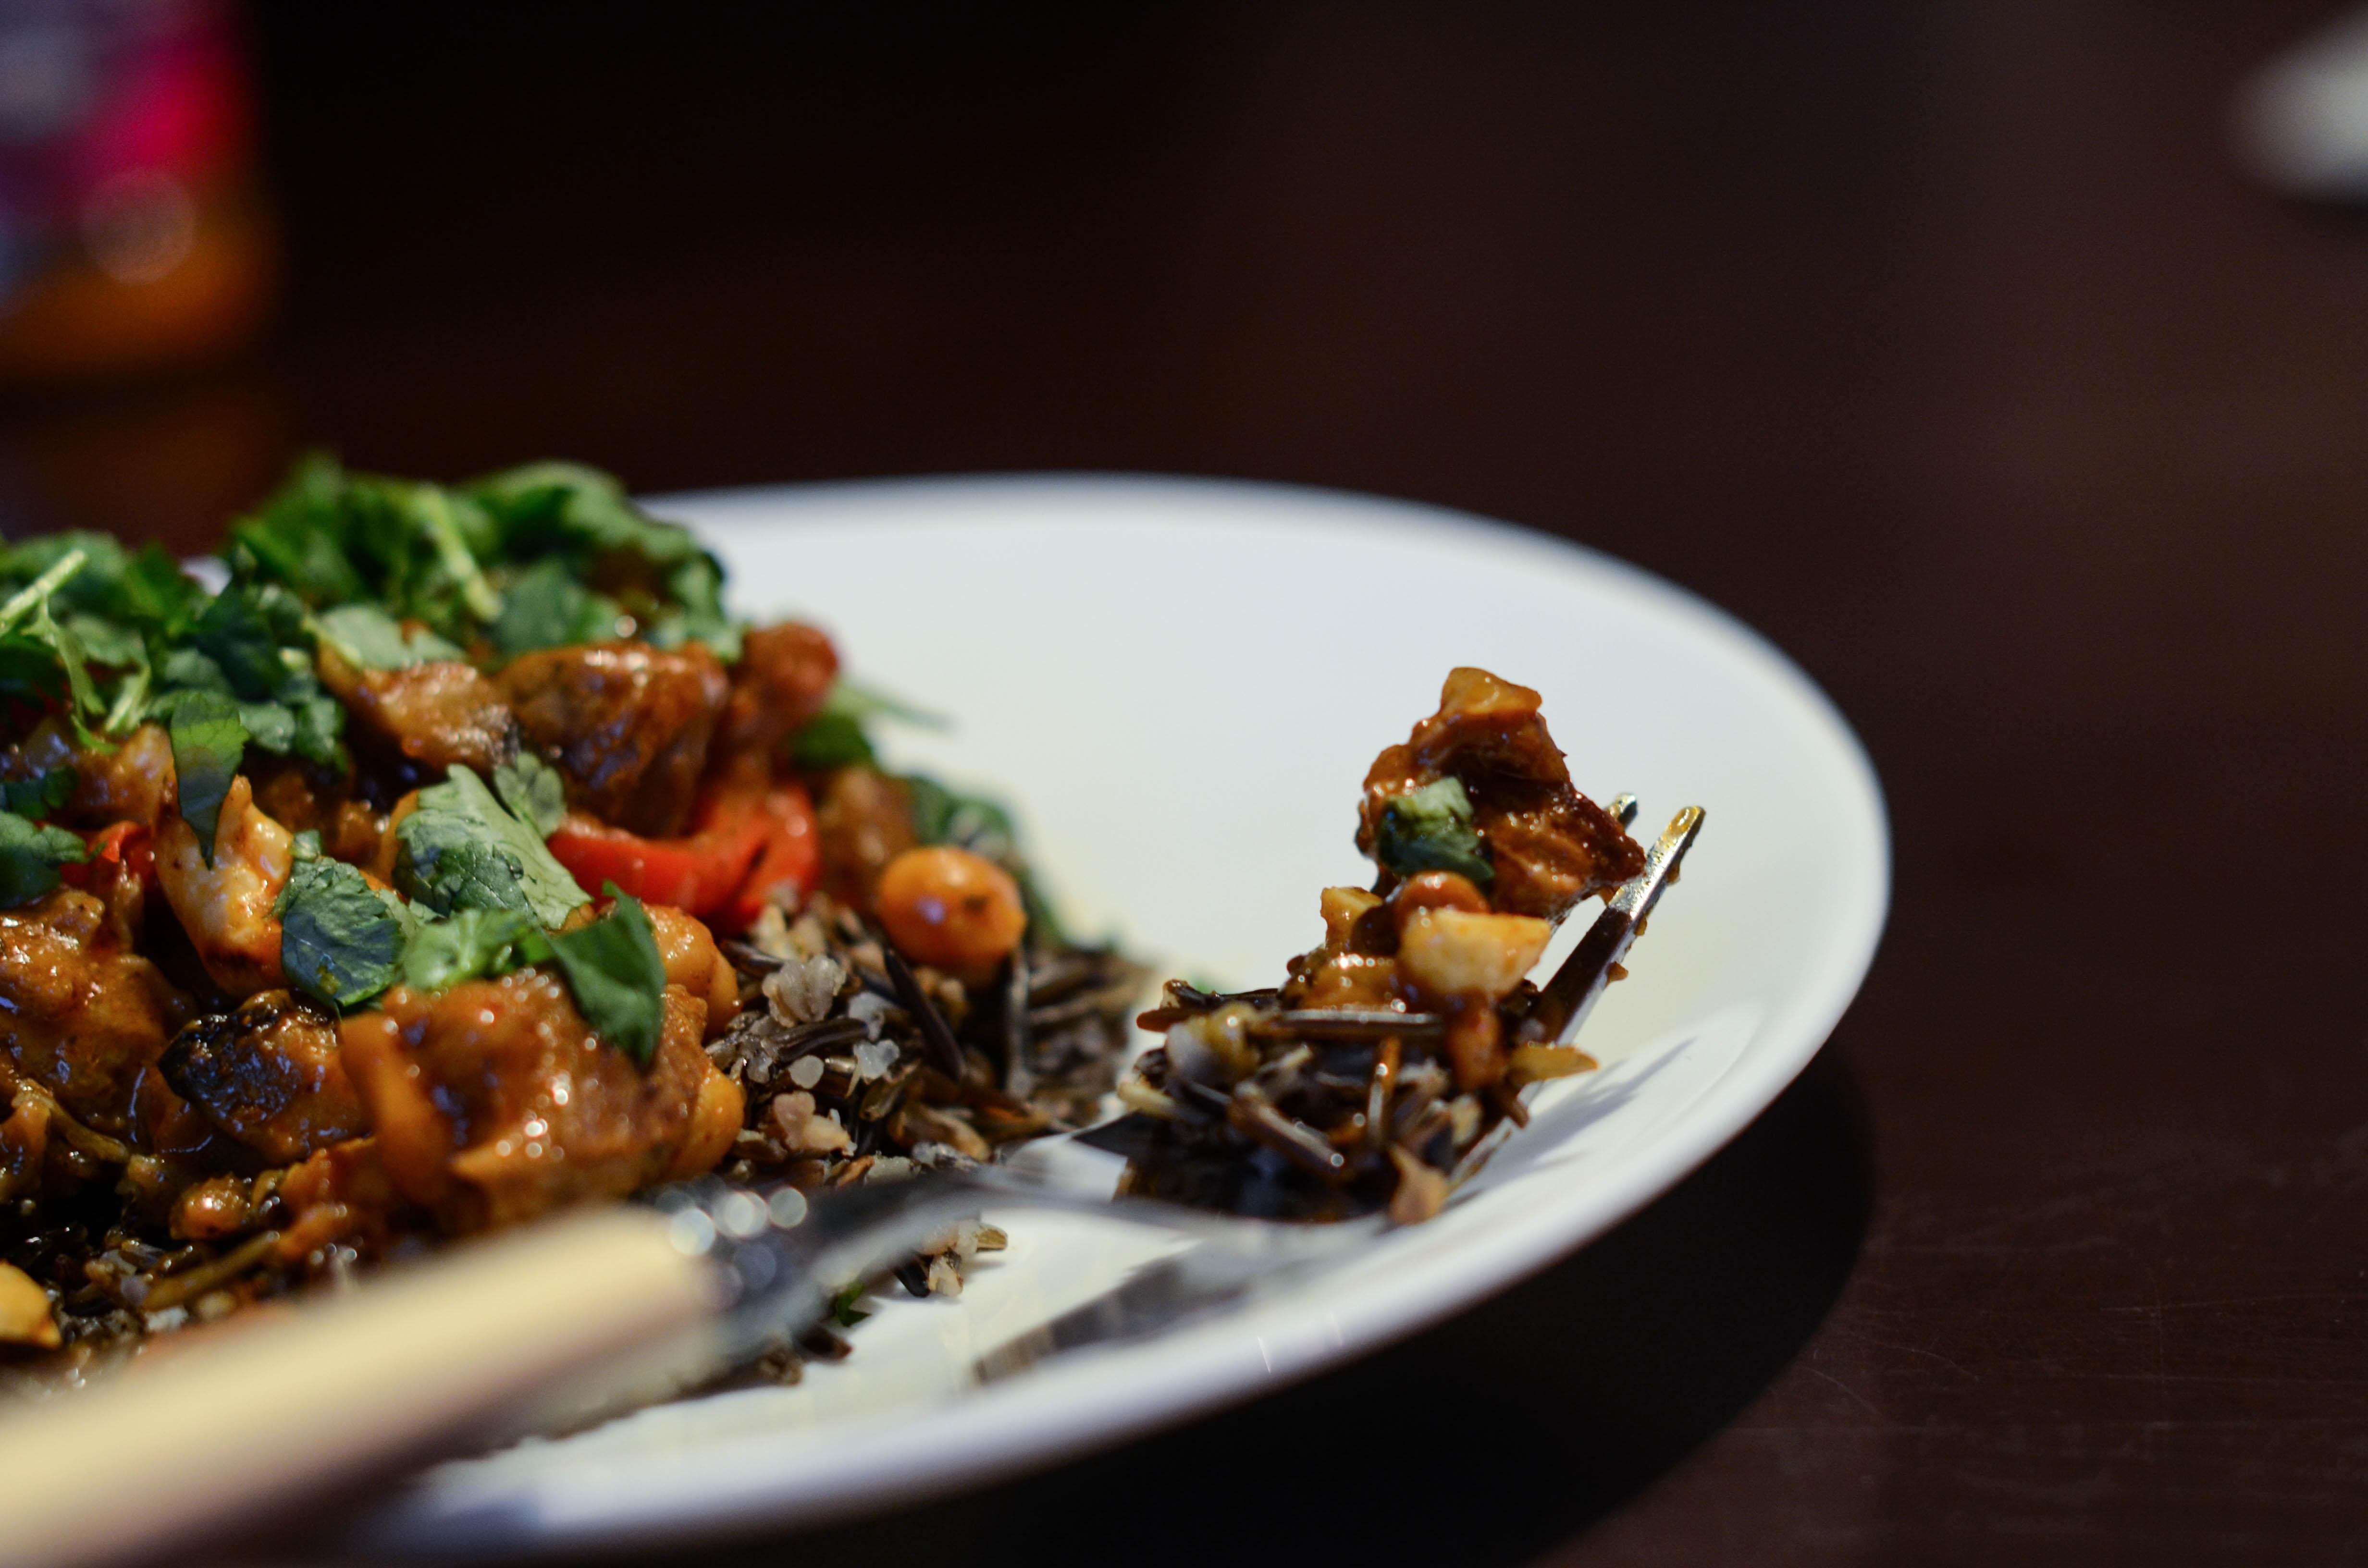 jagnięcina tikka masala